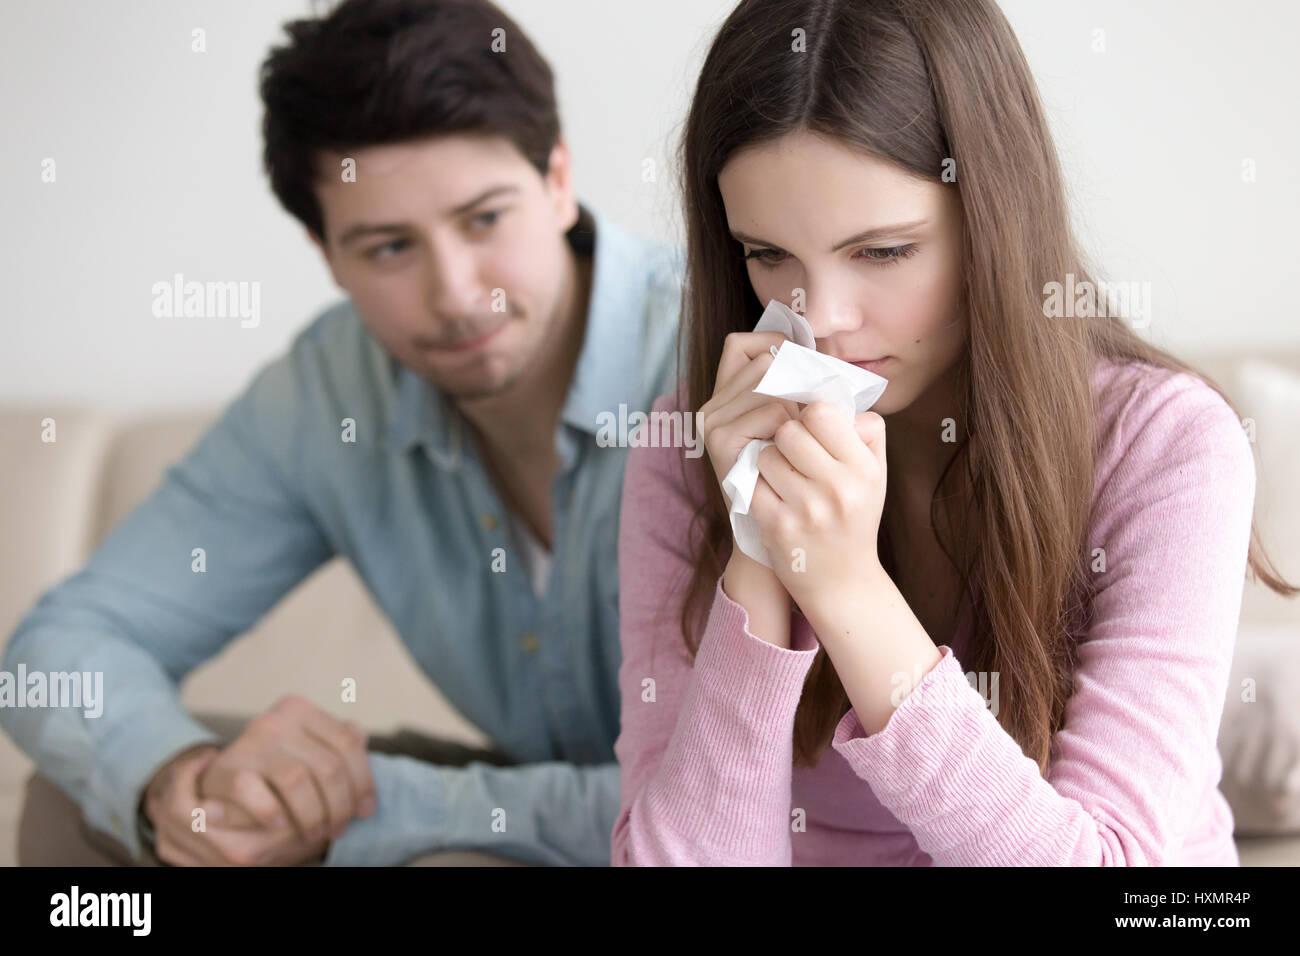 Guy comforting crying woman, boyfriend supporting upset girlfrie Stock Photo